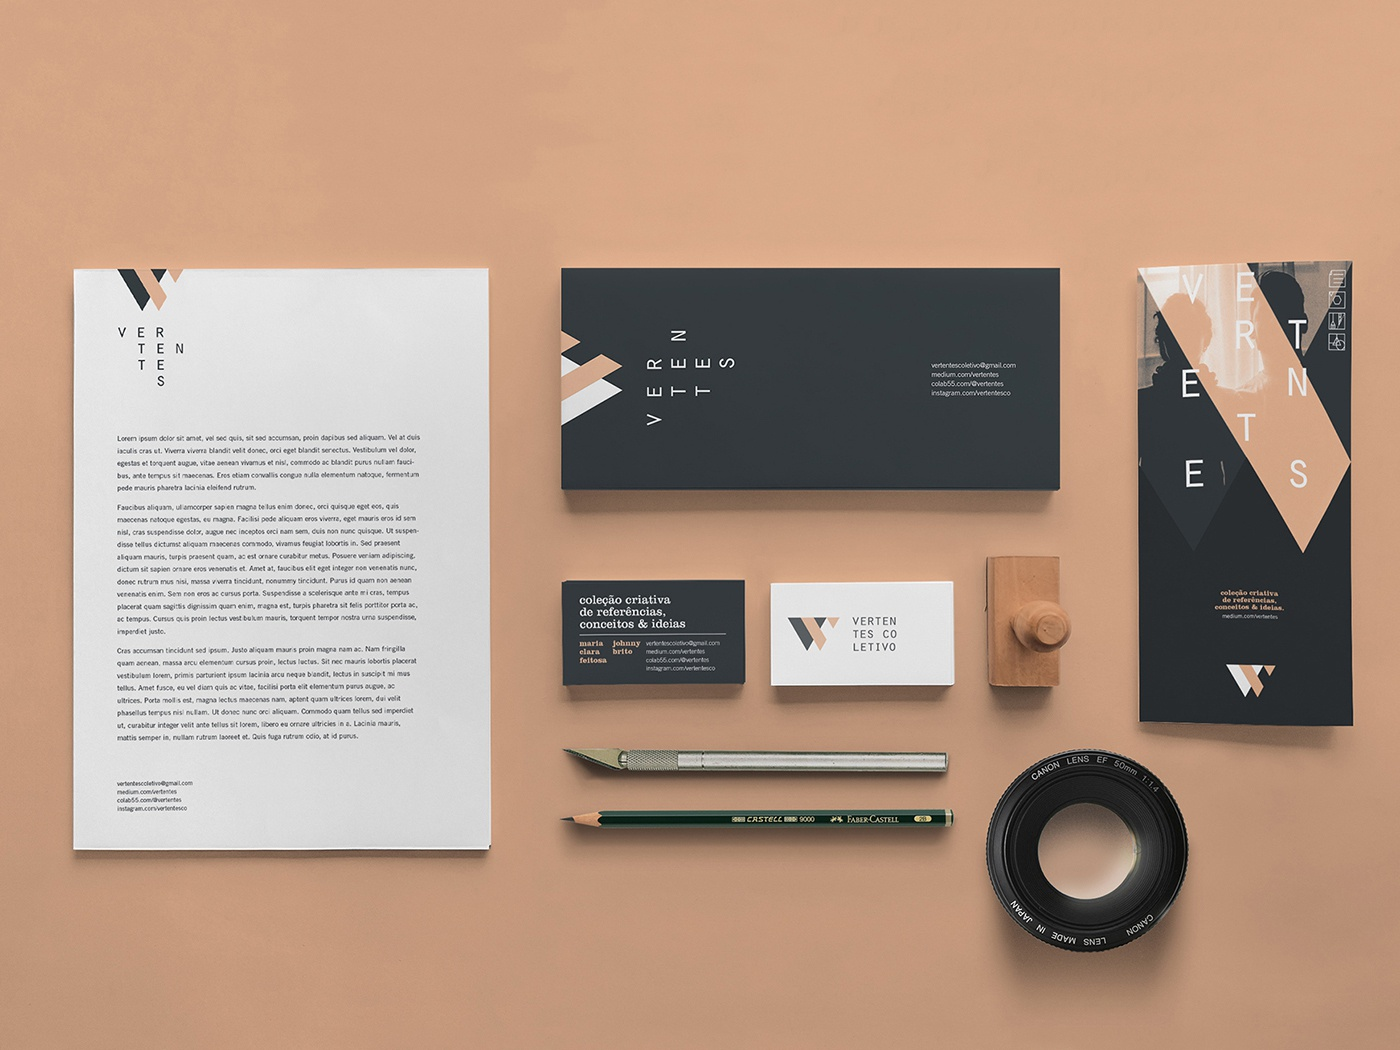 Vertentes Coletivo photograhy brazil vertentes branding design studio graphic design collective brand identity logo